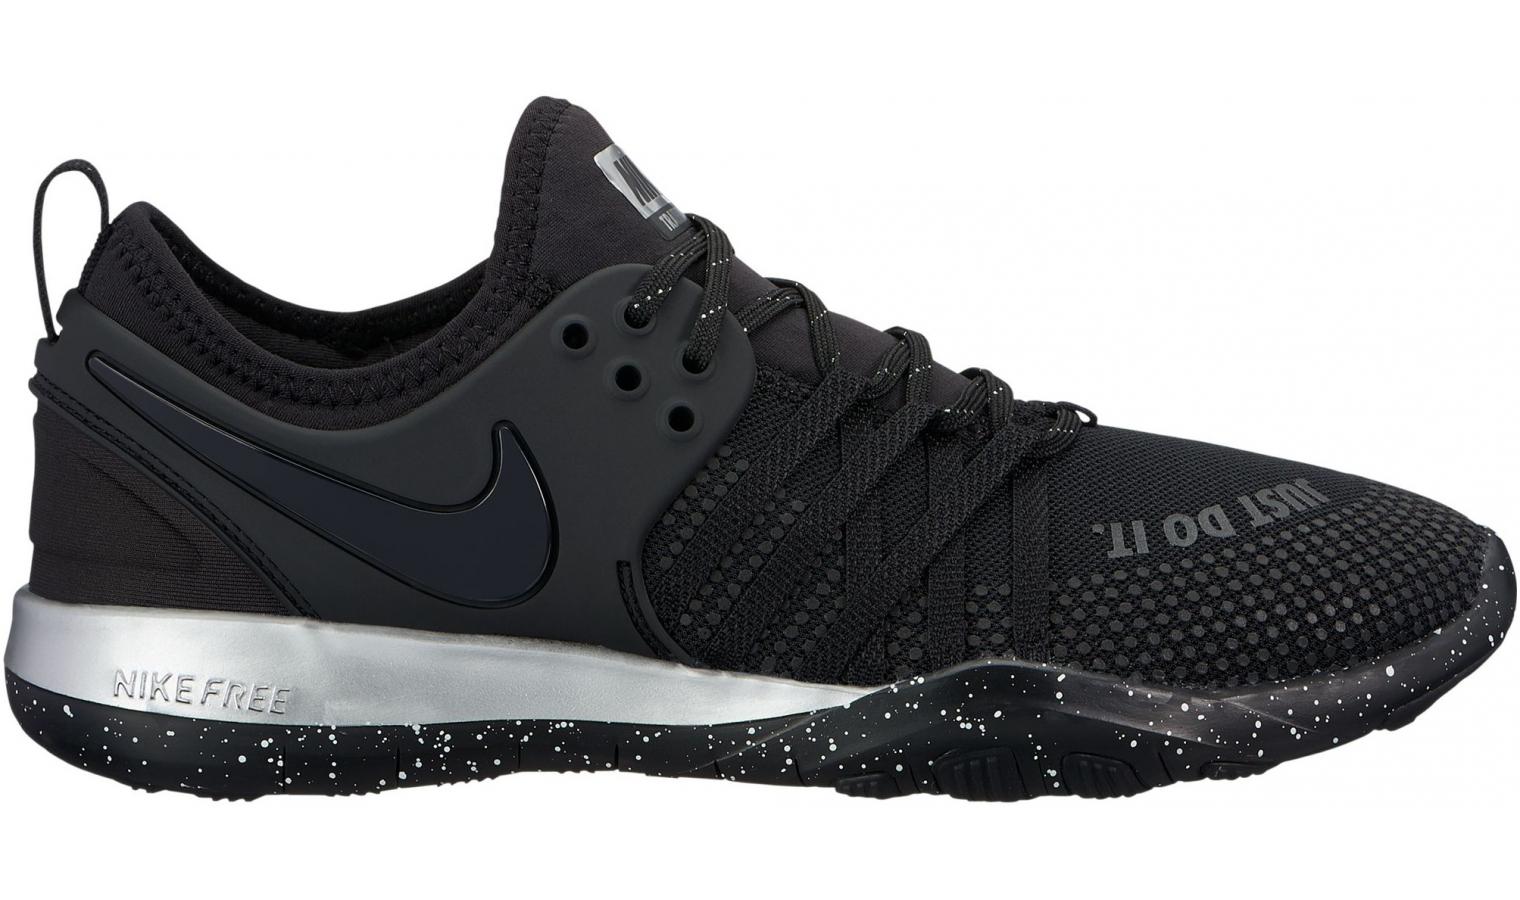 fcdb0f10ab53 Dámske tréningové topánky Nike FREE TR 7 SELFIE TRAINING W čierne ...